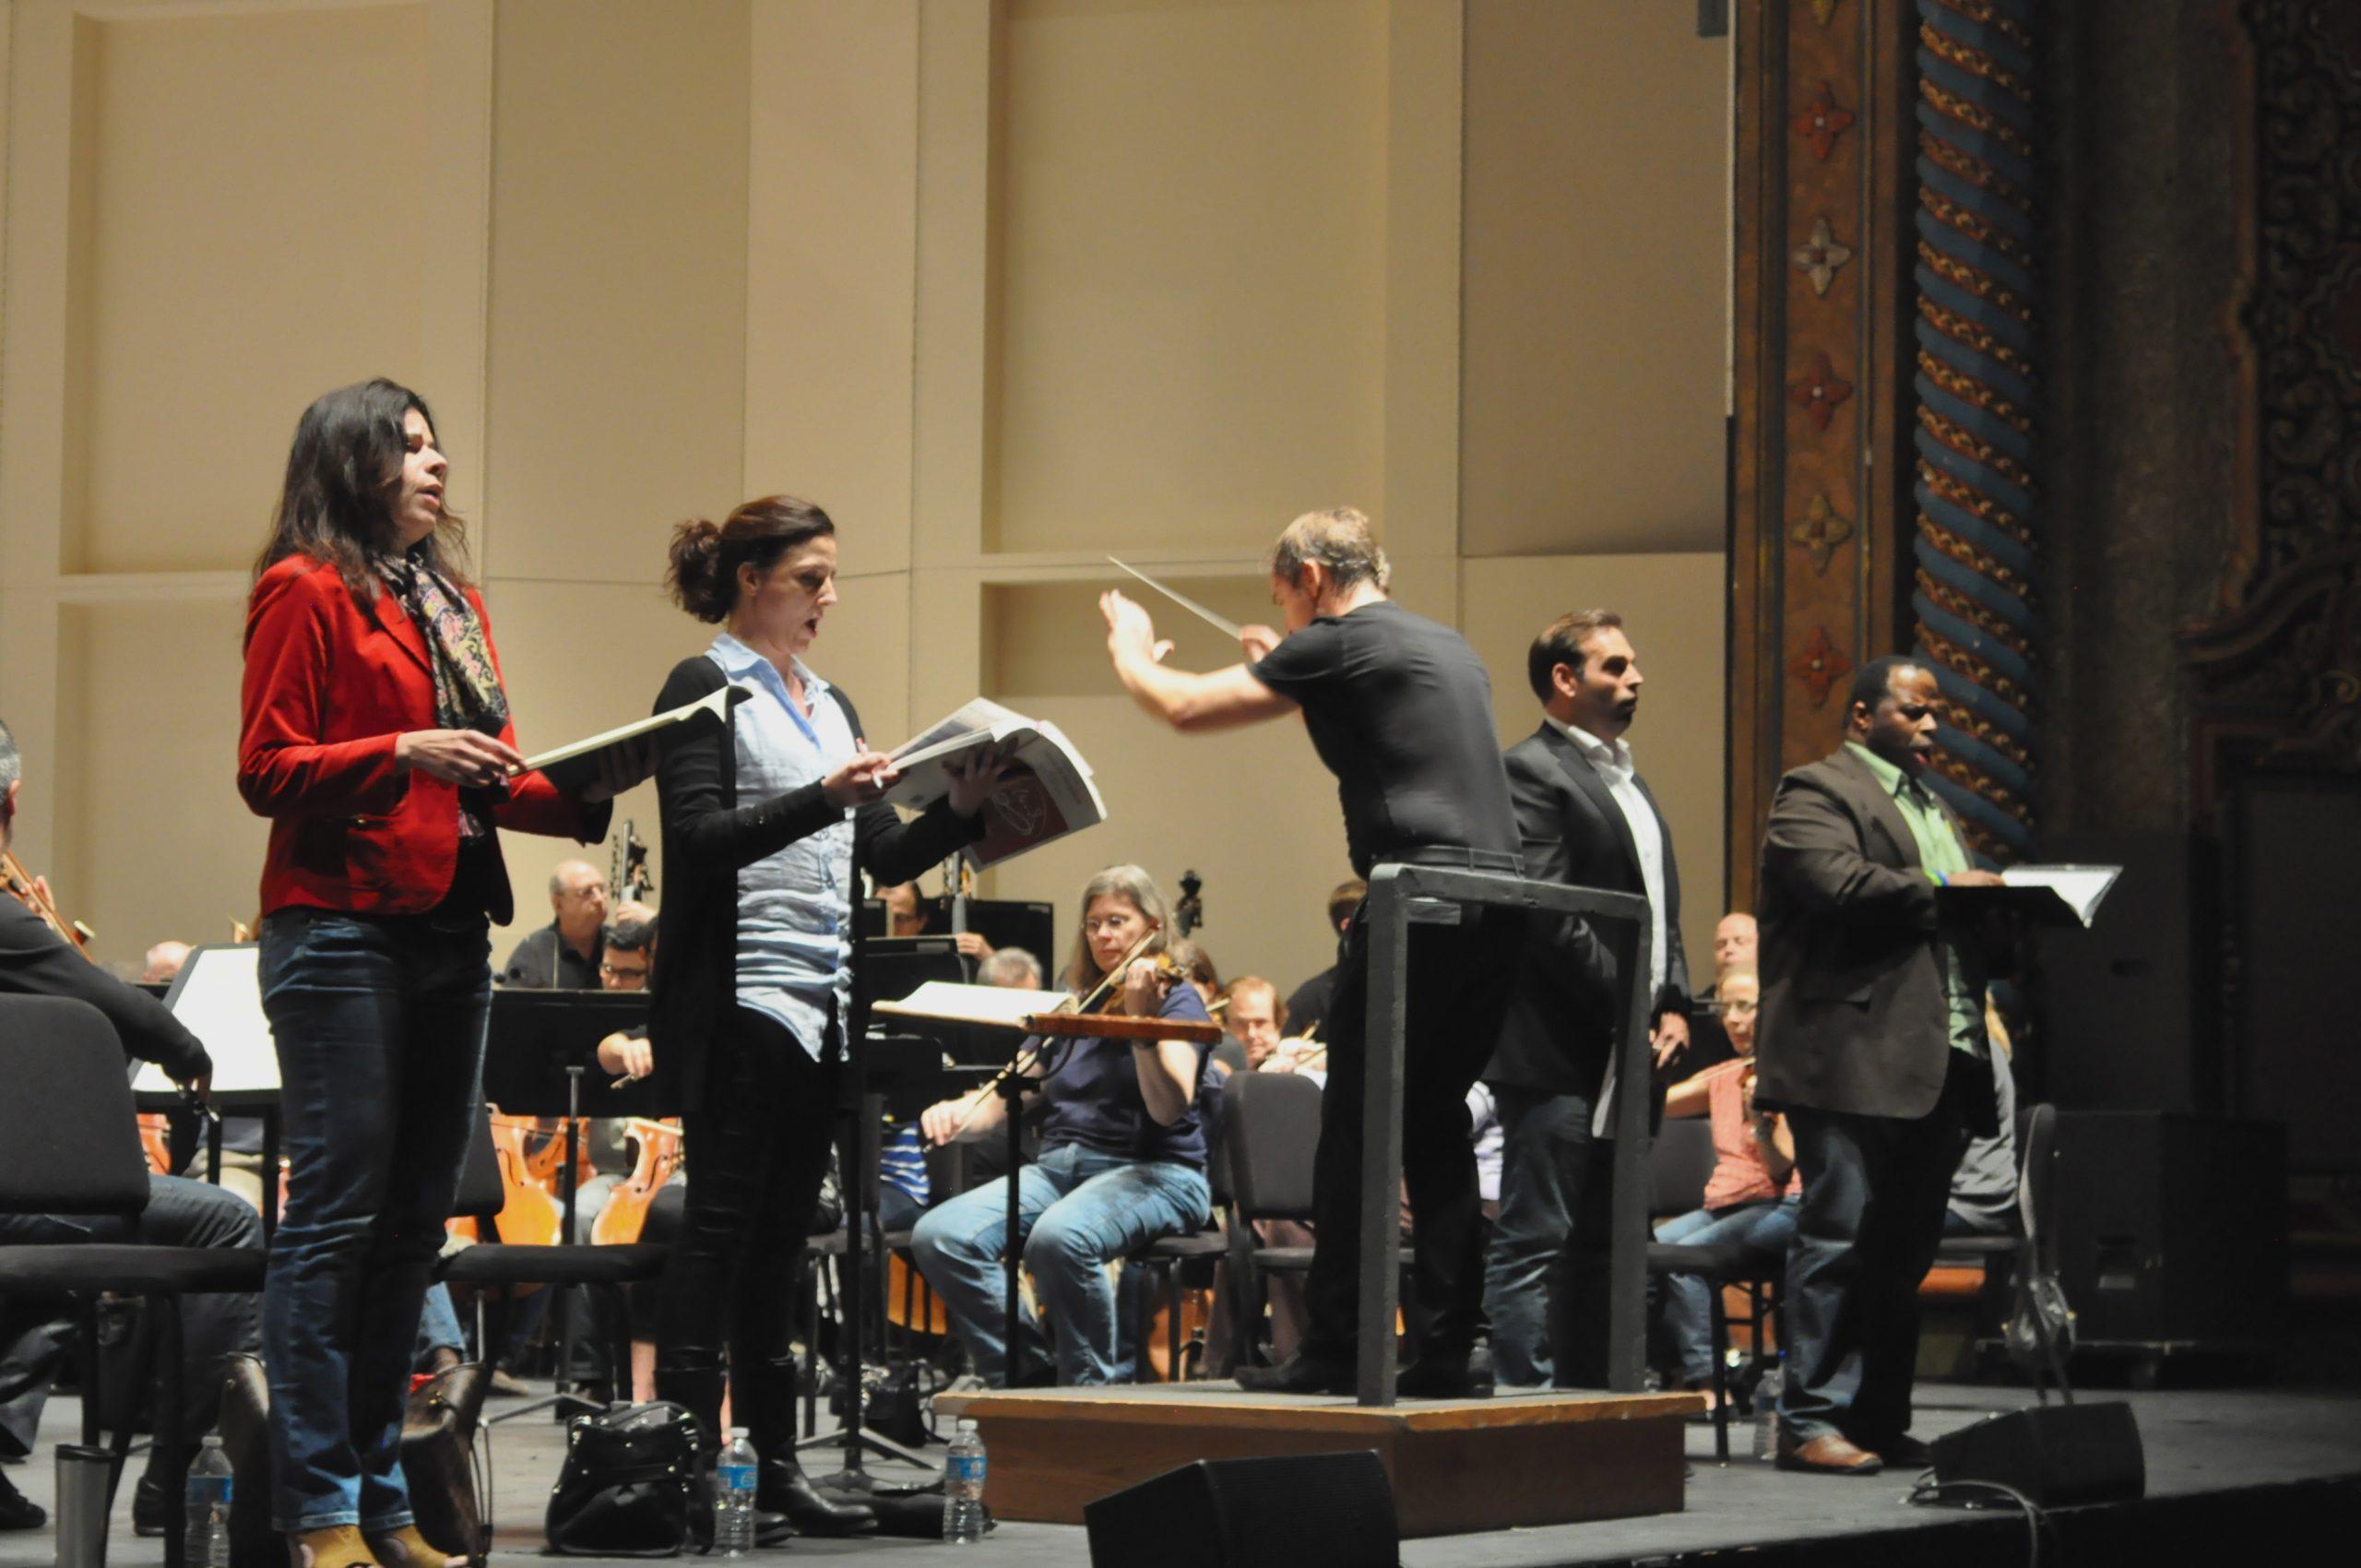 (Front left) Soprano Ana María Martínez, mezzo-soprano Géraldine Chauvet, Music Director Sebastian Lang-Lessing, tenor Dimitri Pittas, and baritone Lester Lynch. Photo by Iris Dimmick.